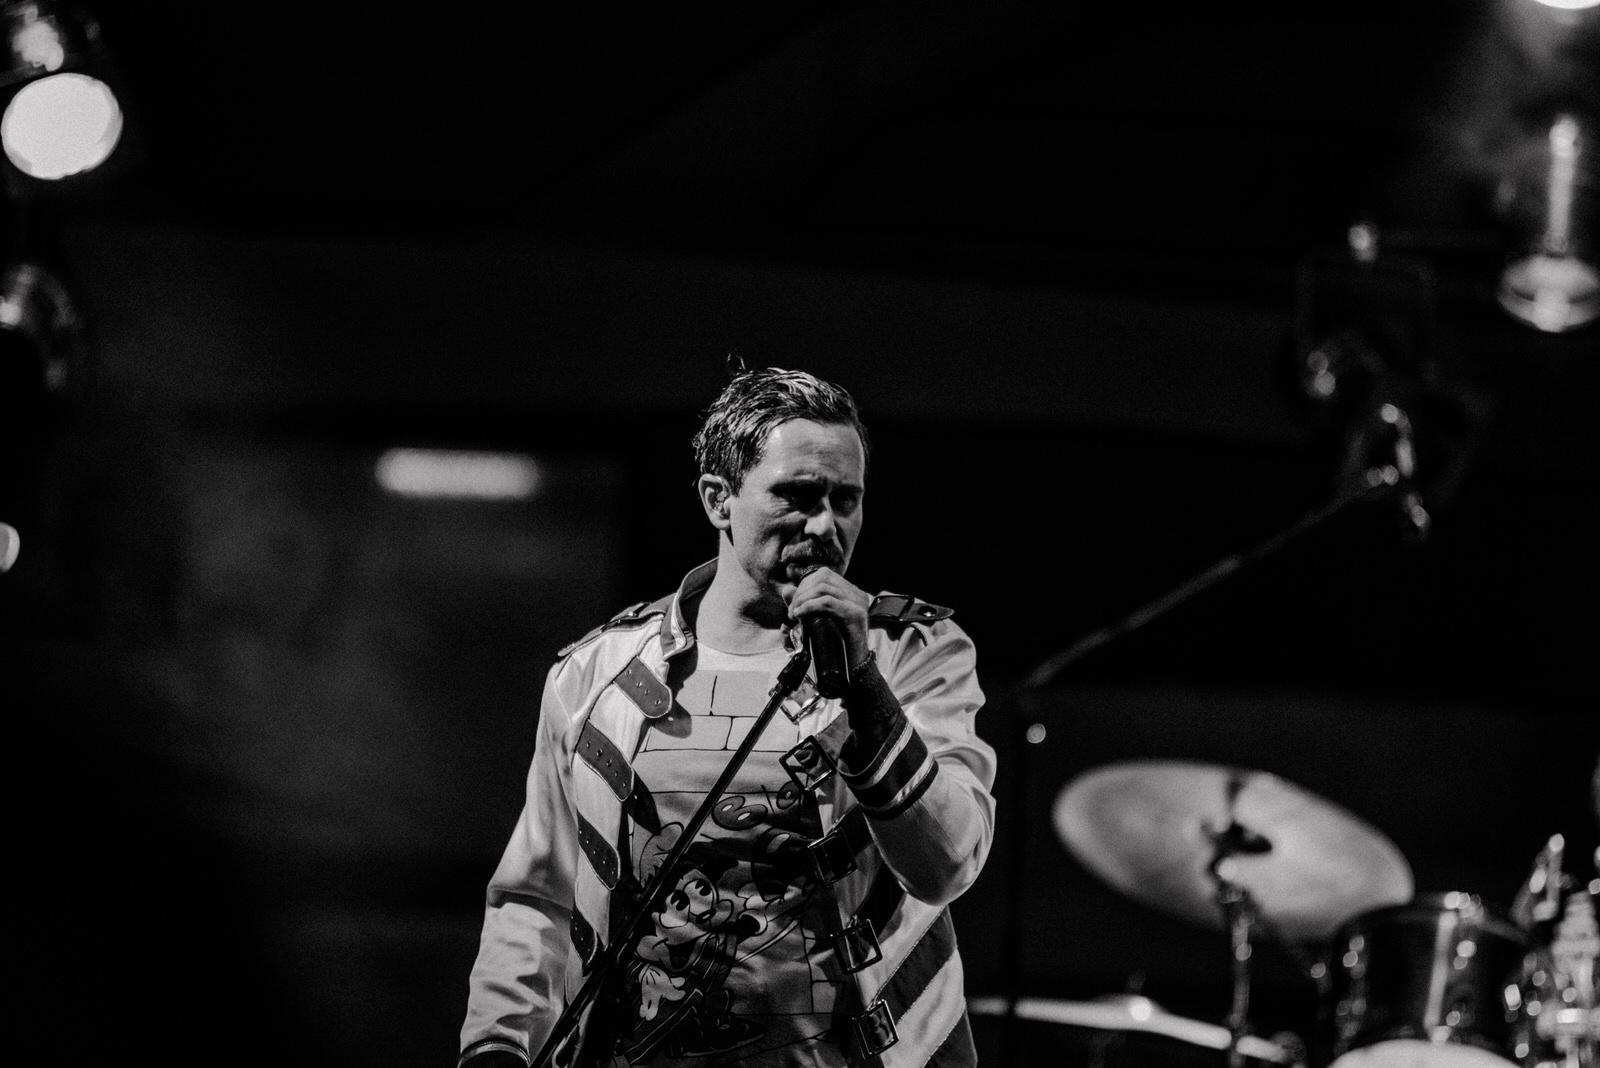 likaclub_novalja_queen-real-tribute-band_2019-4